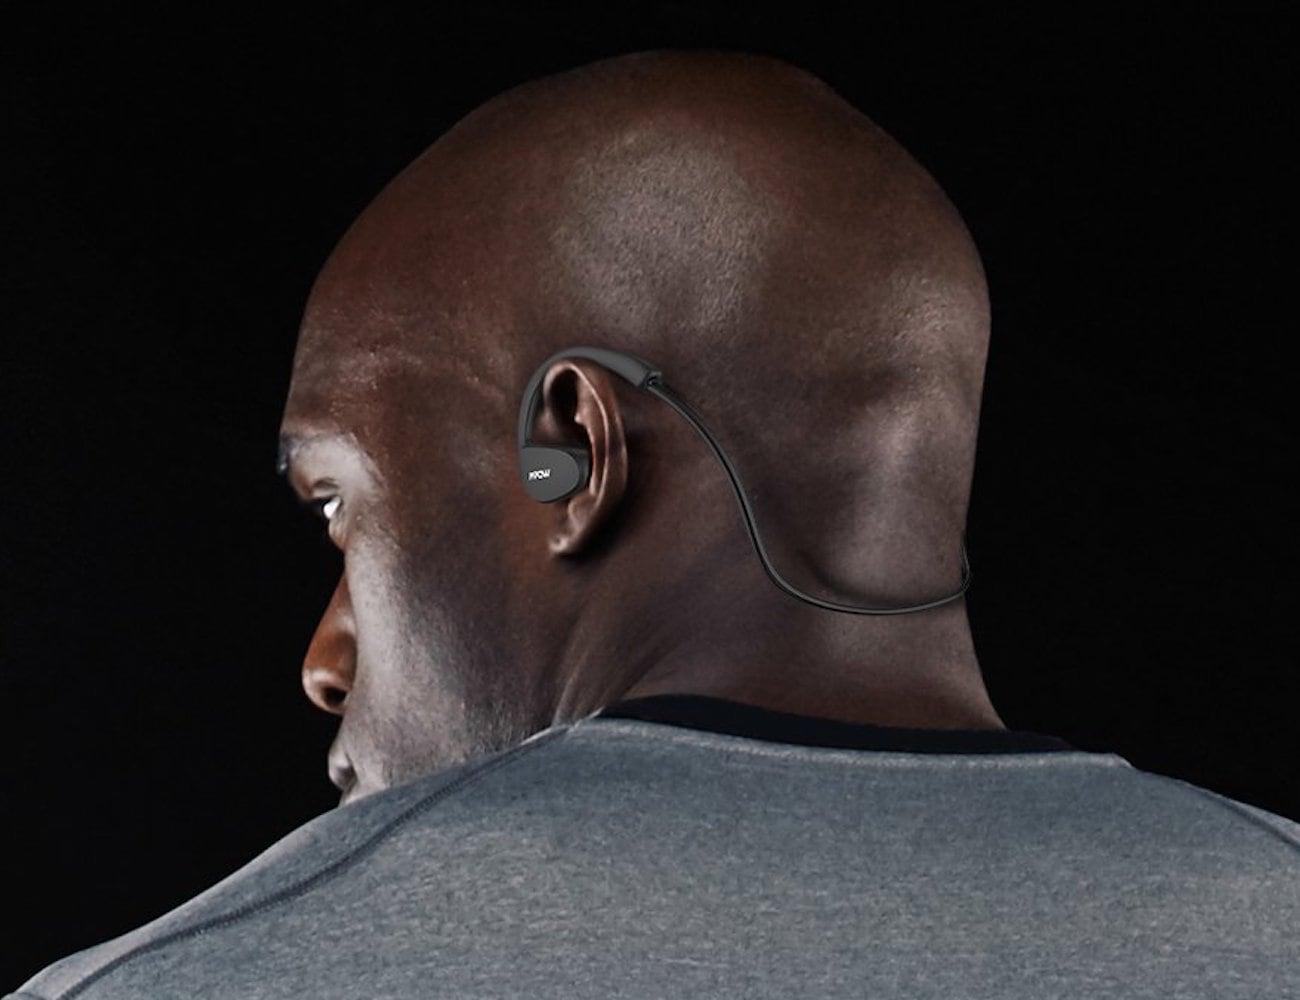 Mpow Cheetah Wireless Sport Headset